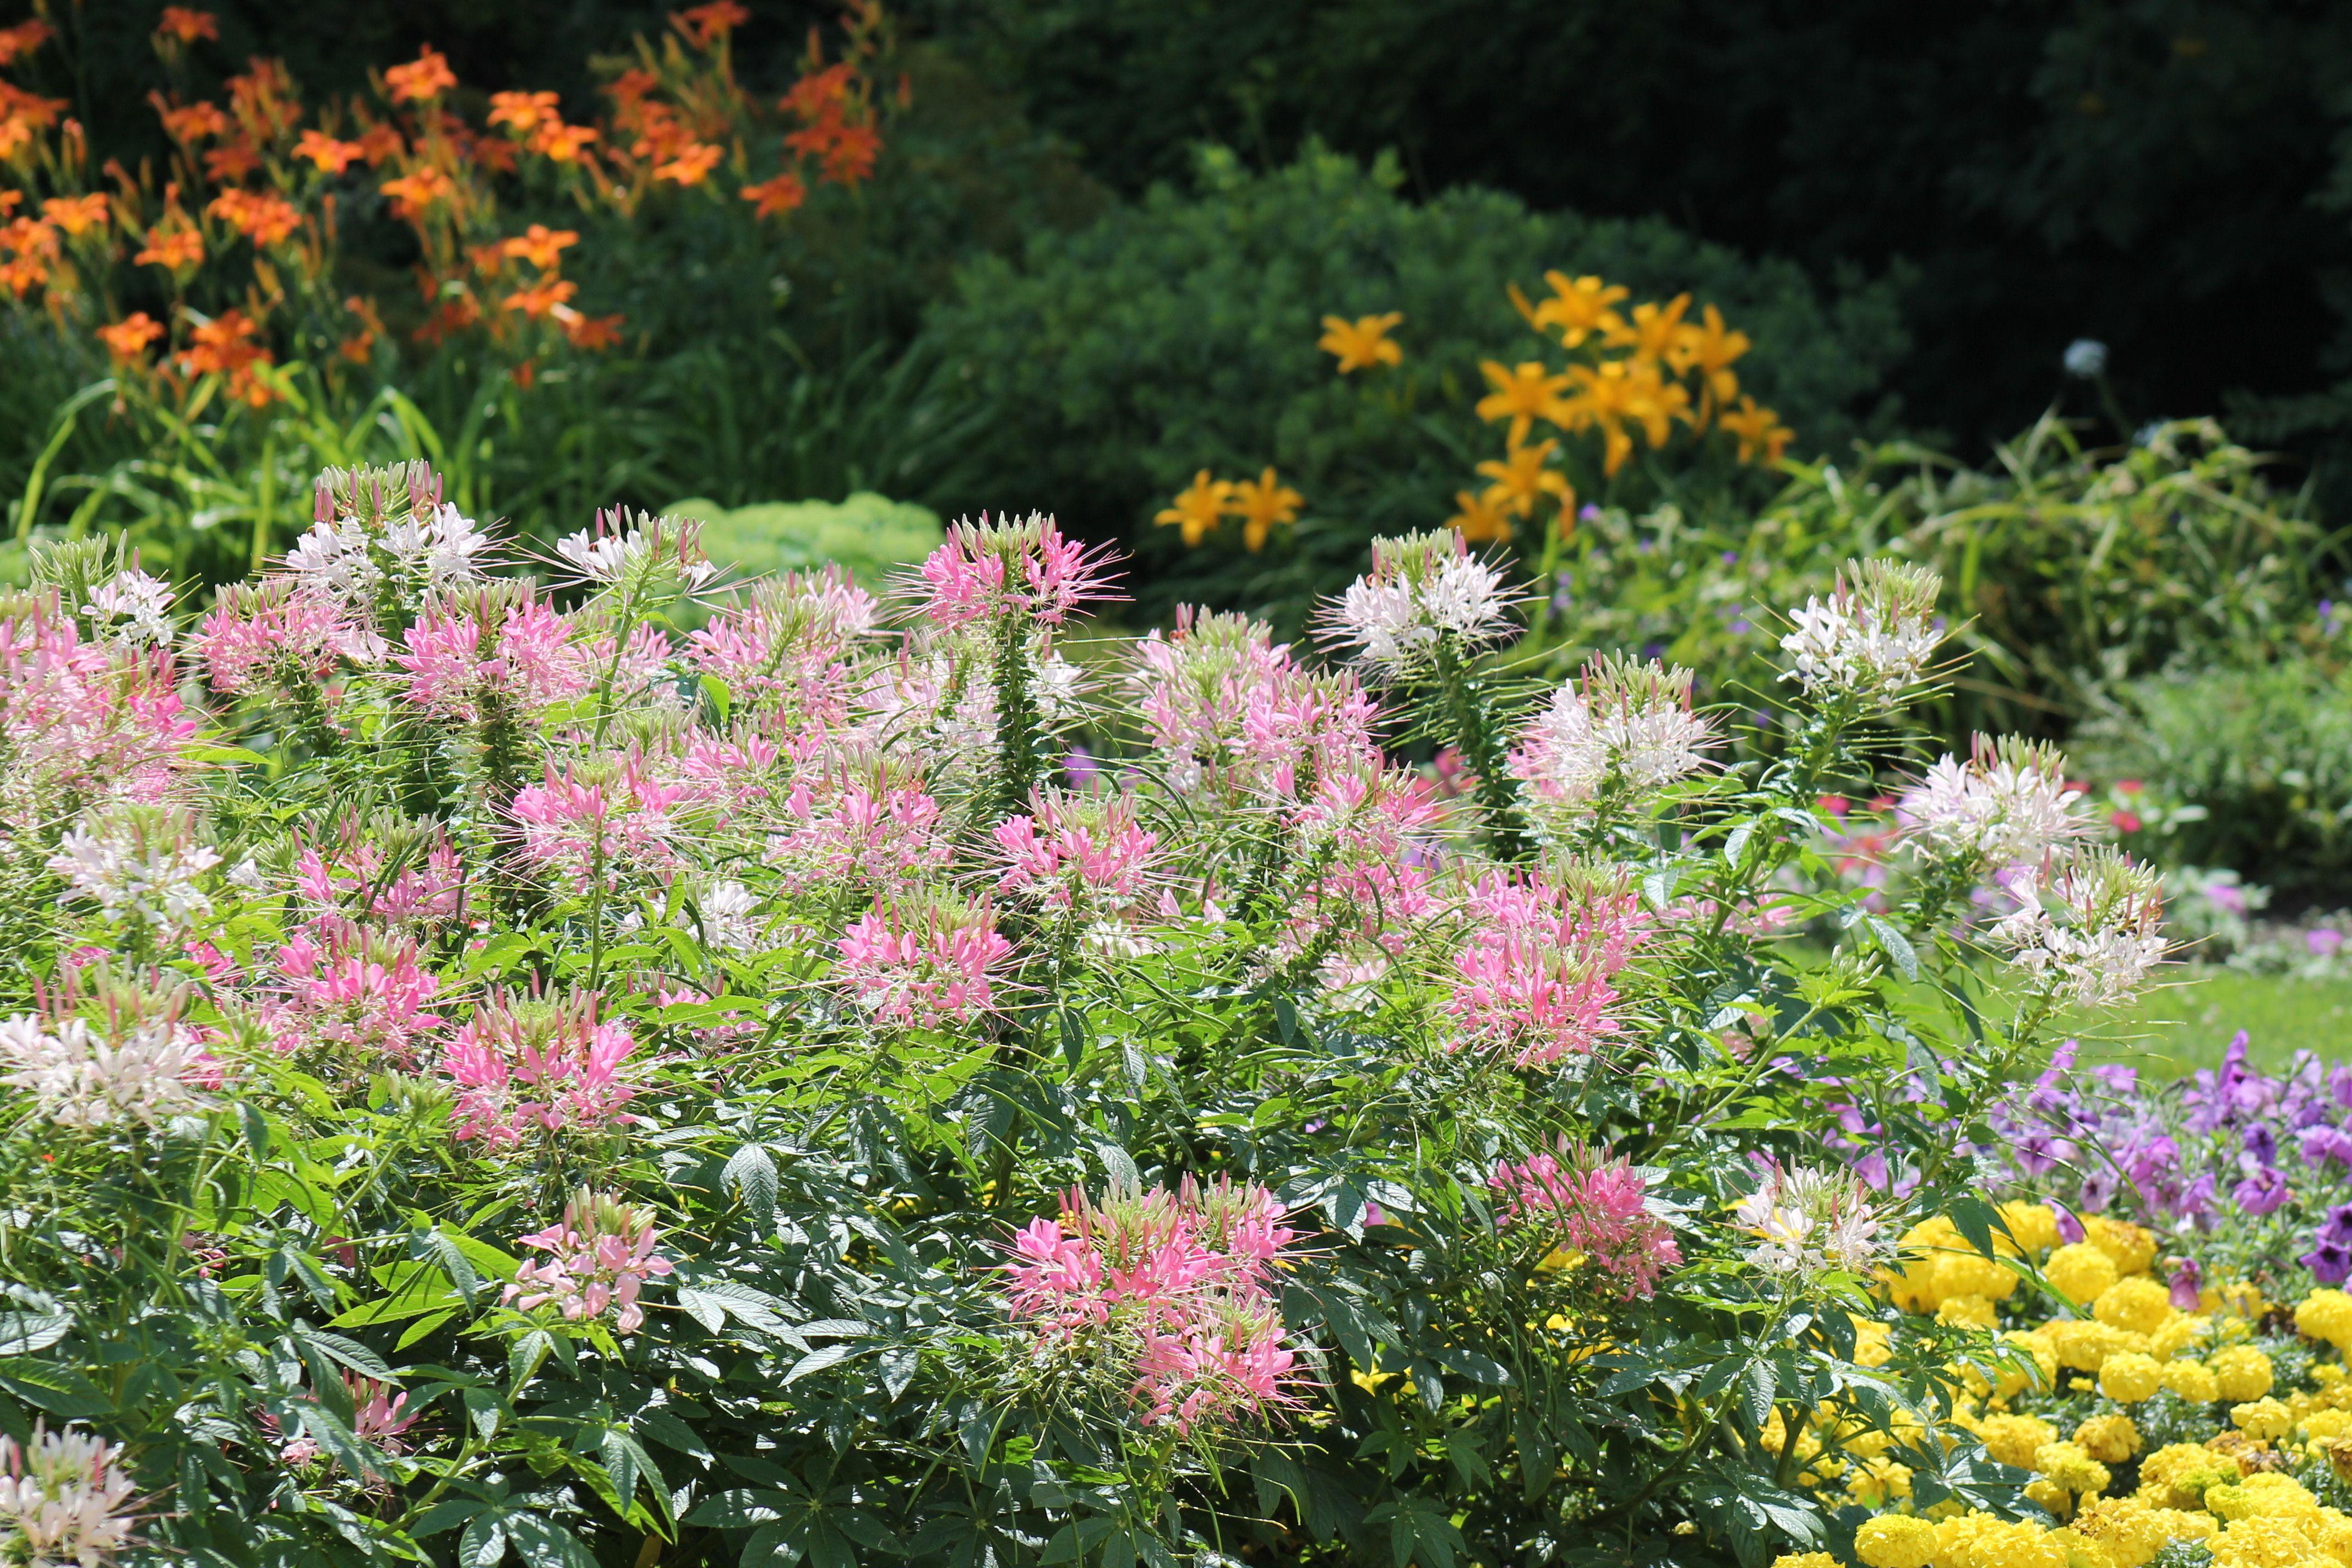 Why did the elder profess the garden